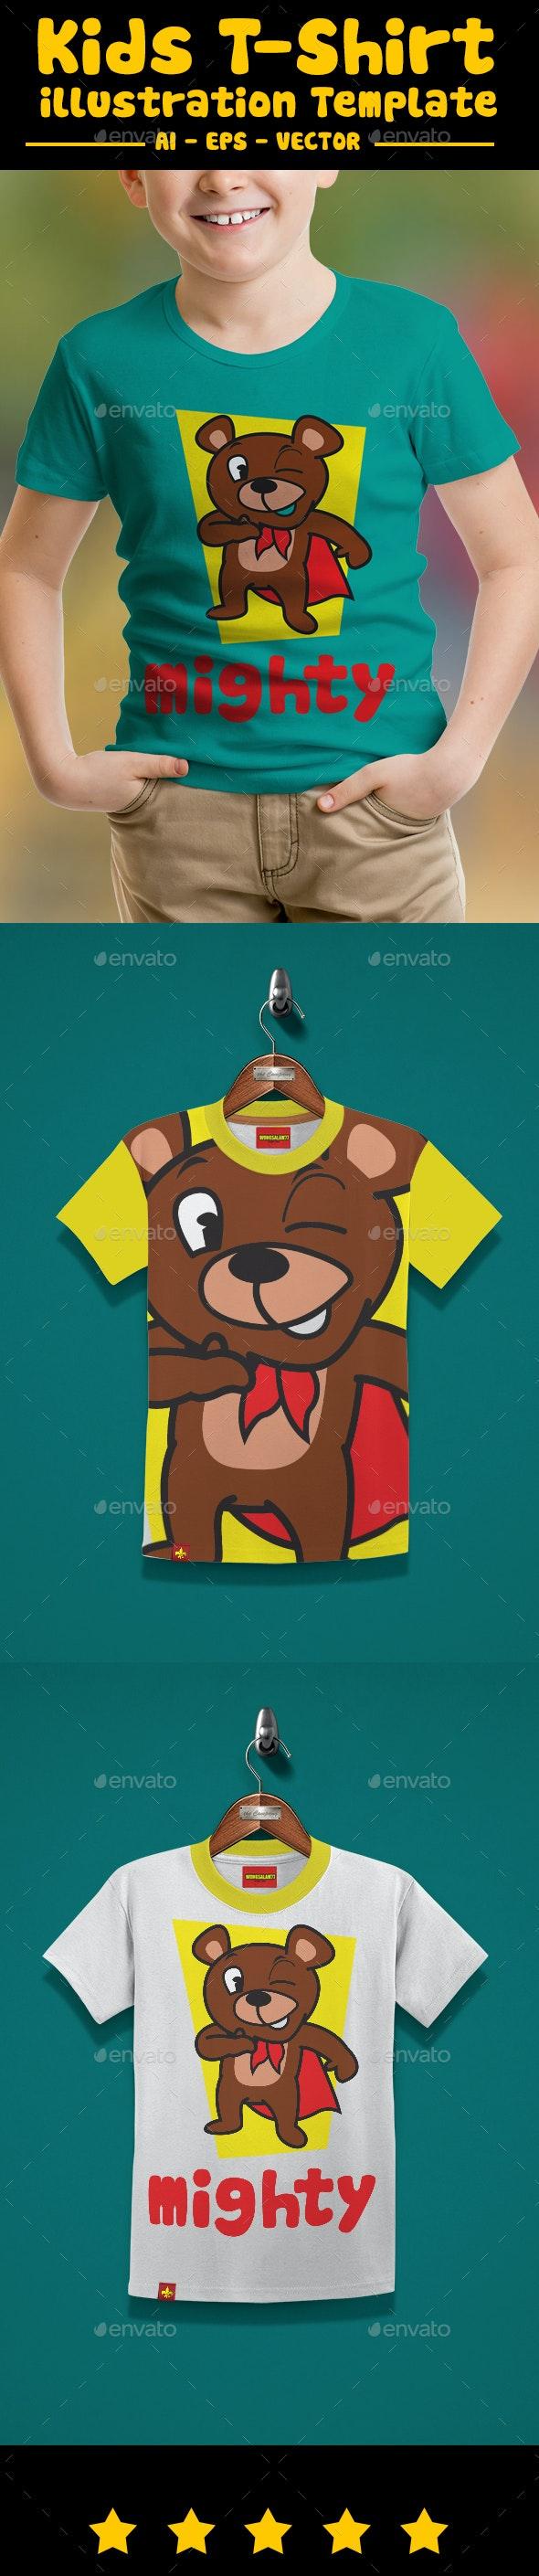 Mighty Kids T-Shirt Design - T-Shirts